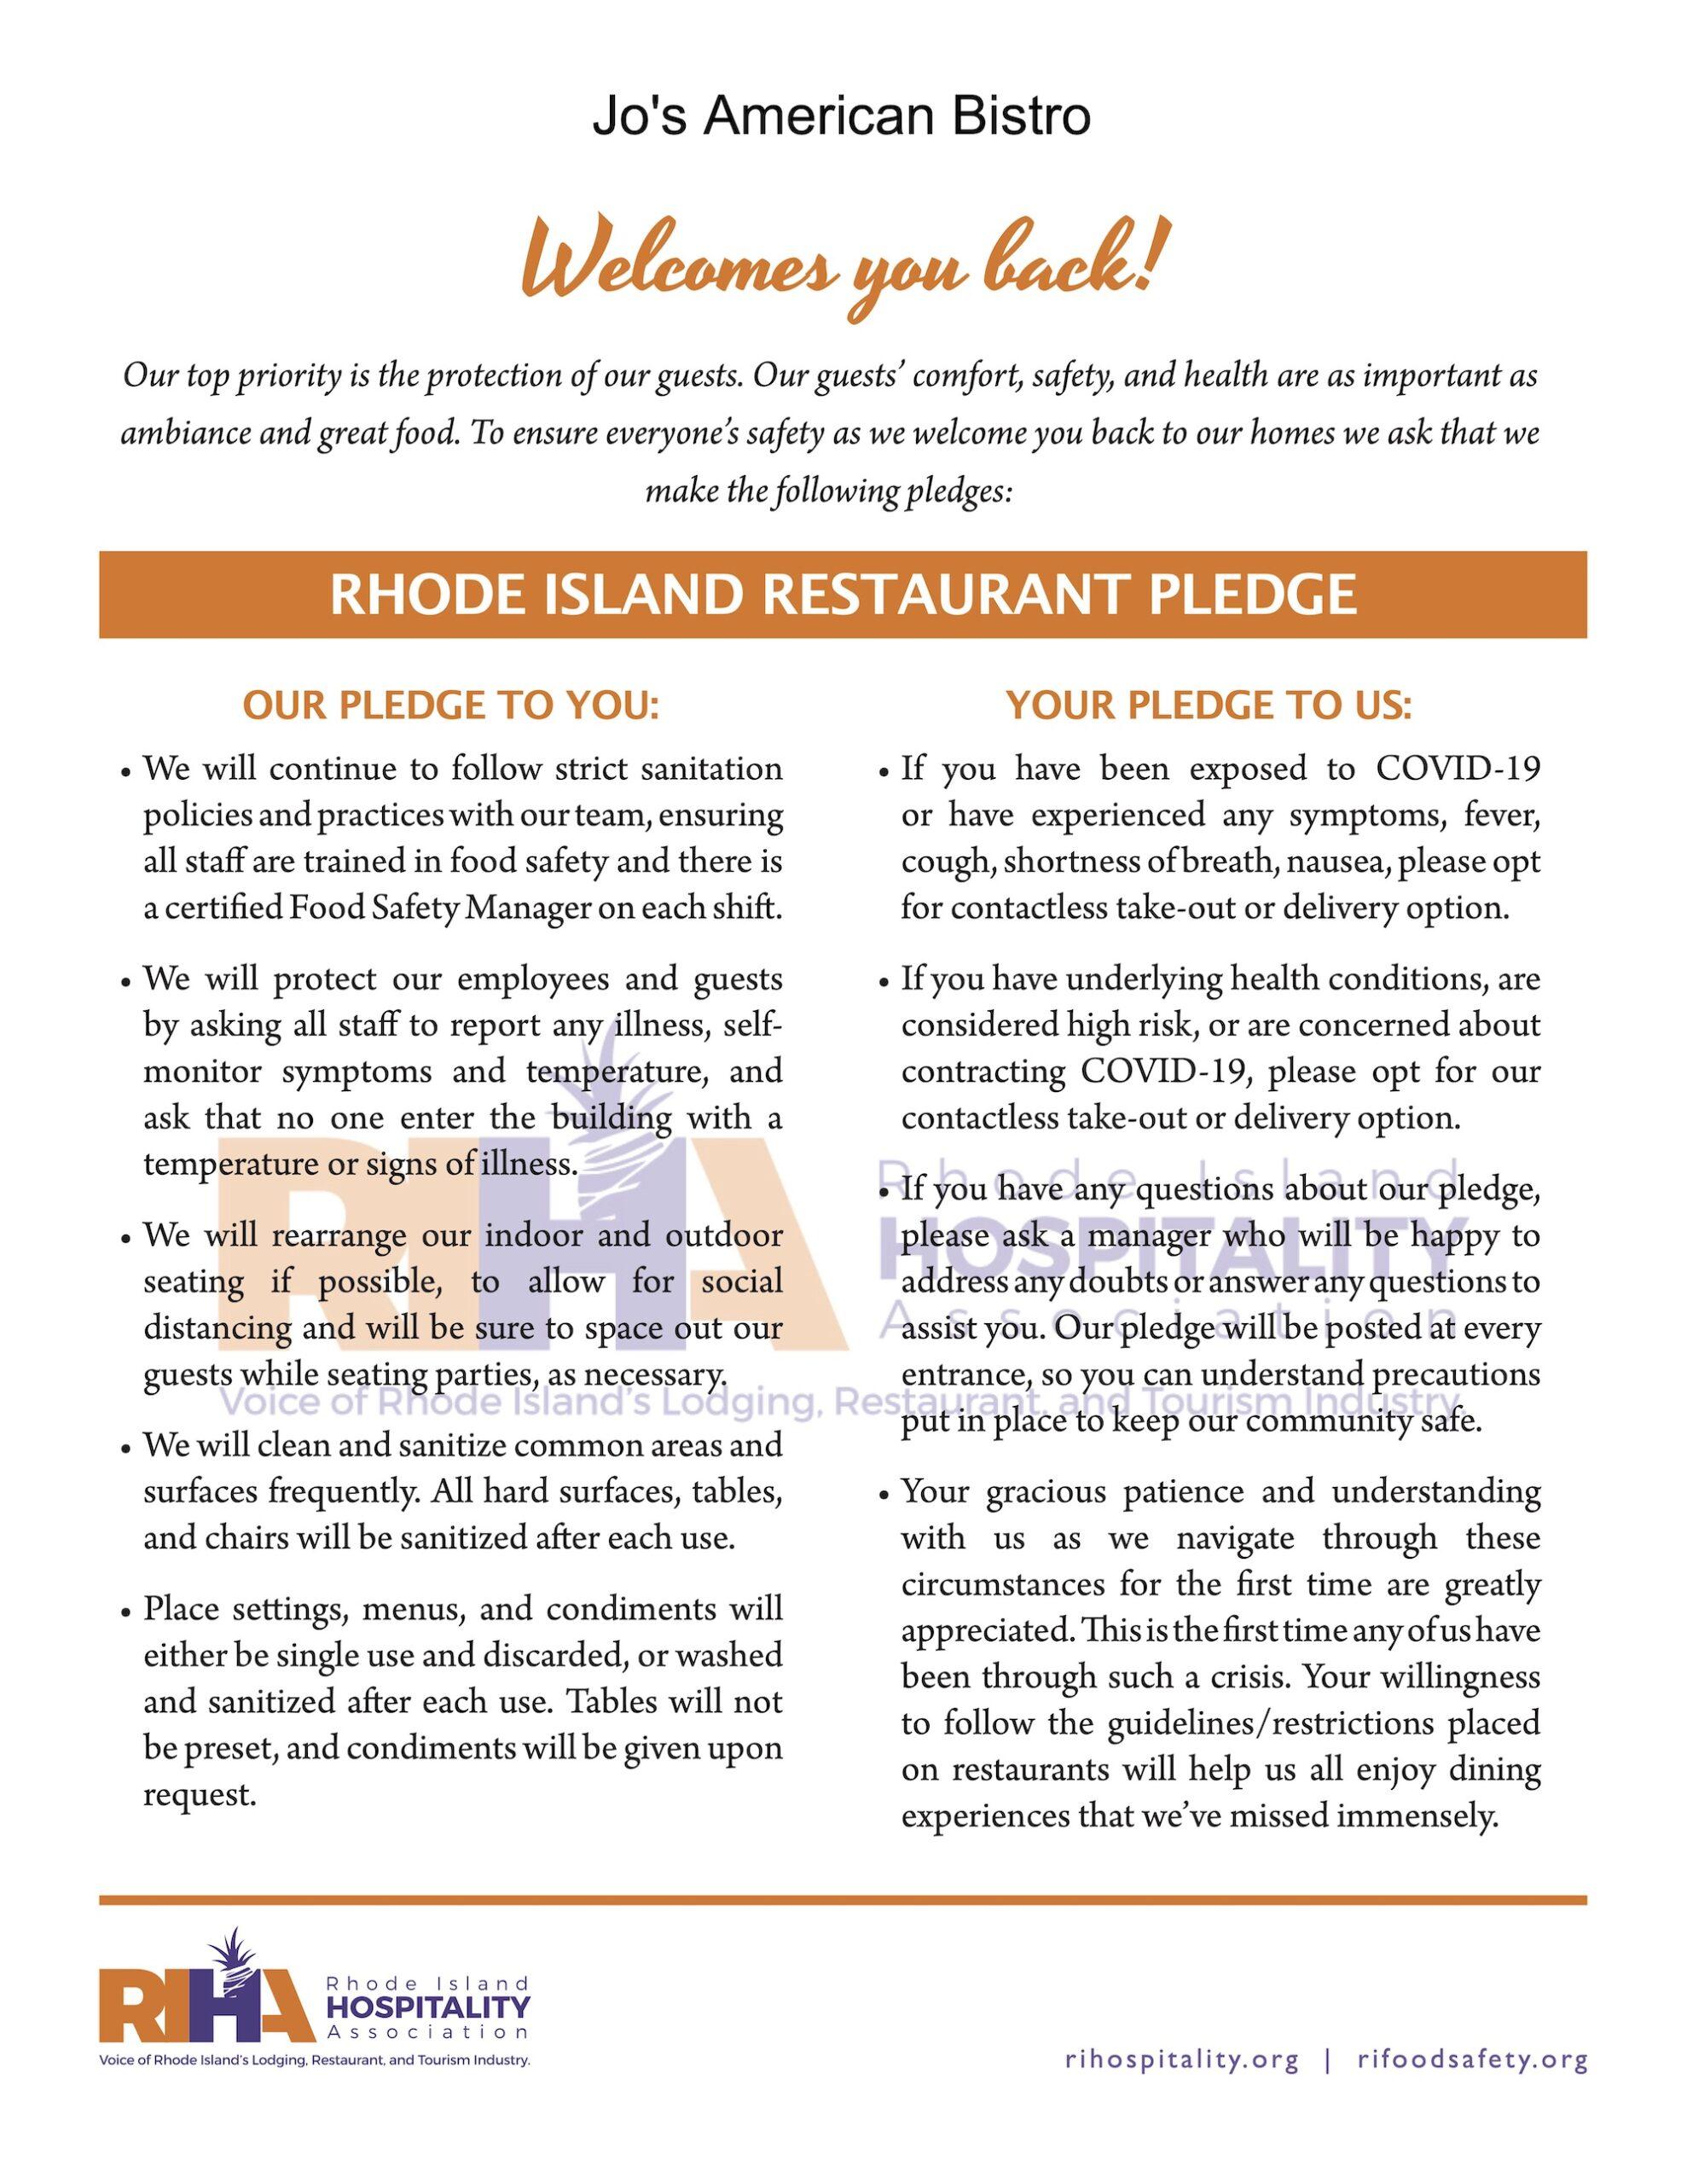 Jos-American-Bistro-Rhode-Island-RI-Restaurant-Pledge-Hospitality-Association